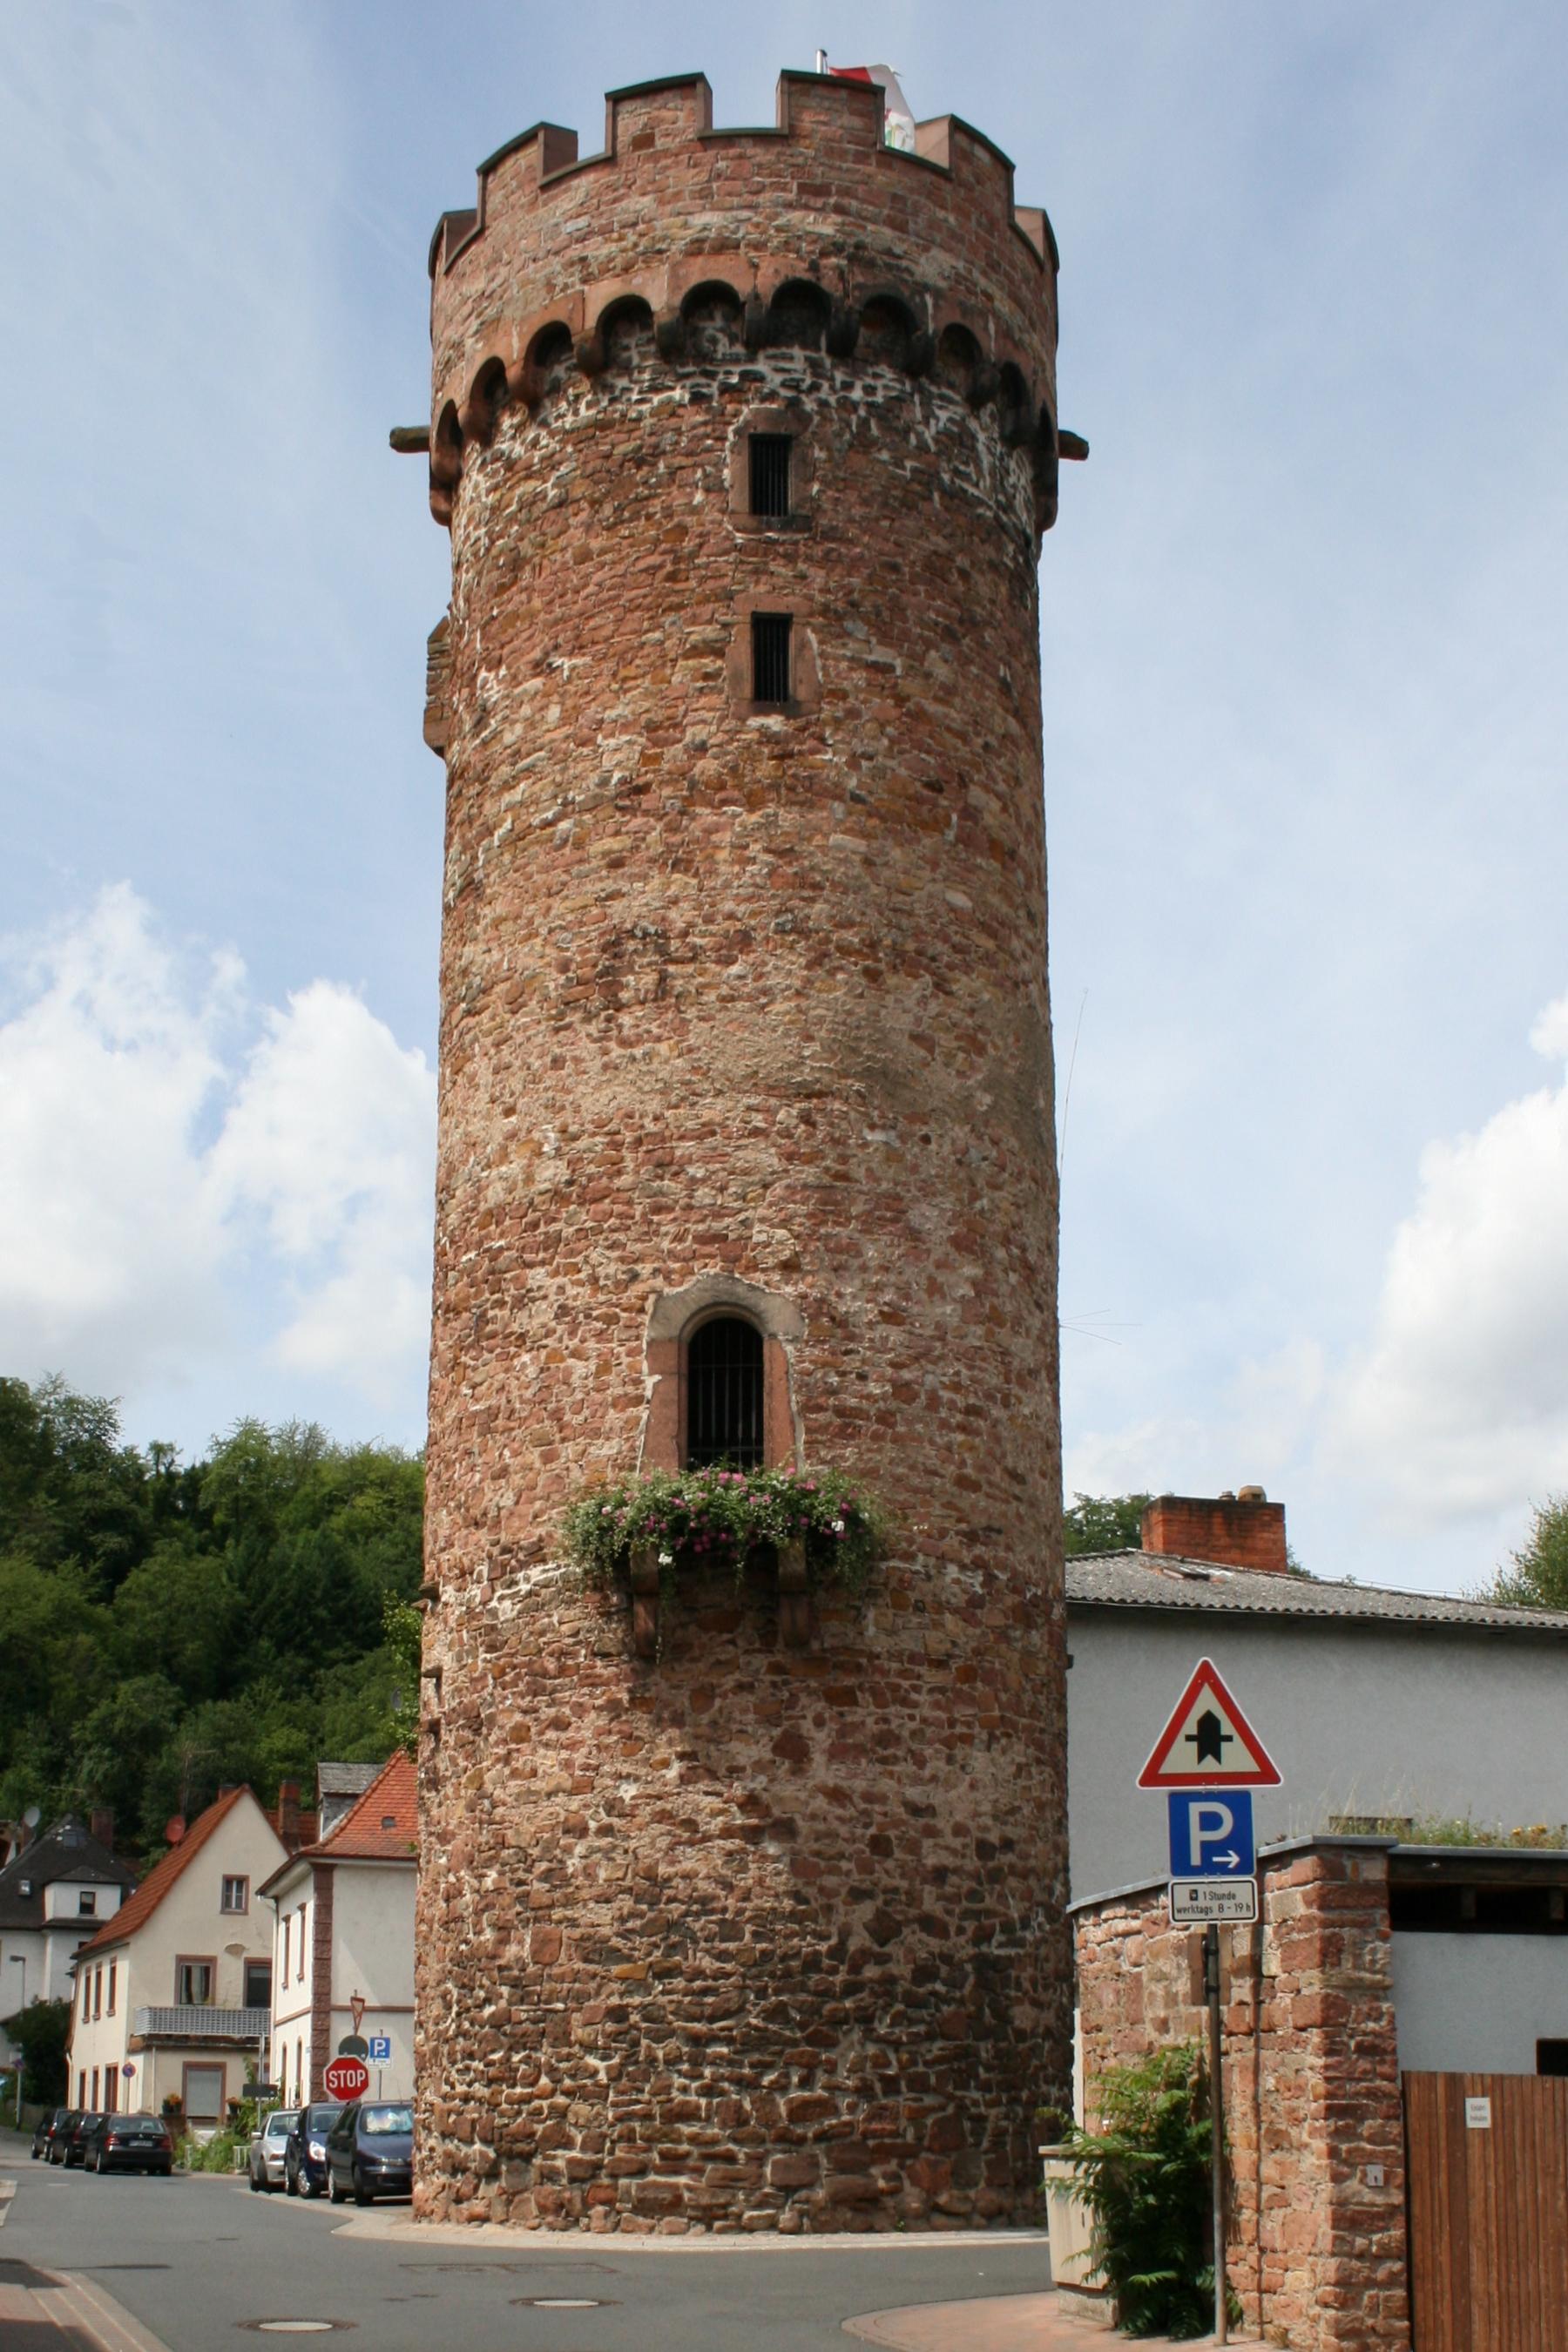 File:Obernburg Runder Turm.jpg - Wikimedia Commons